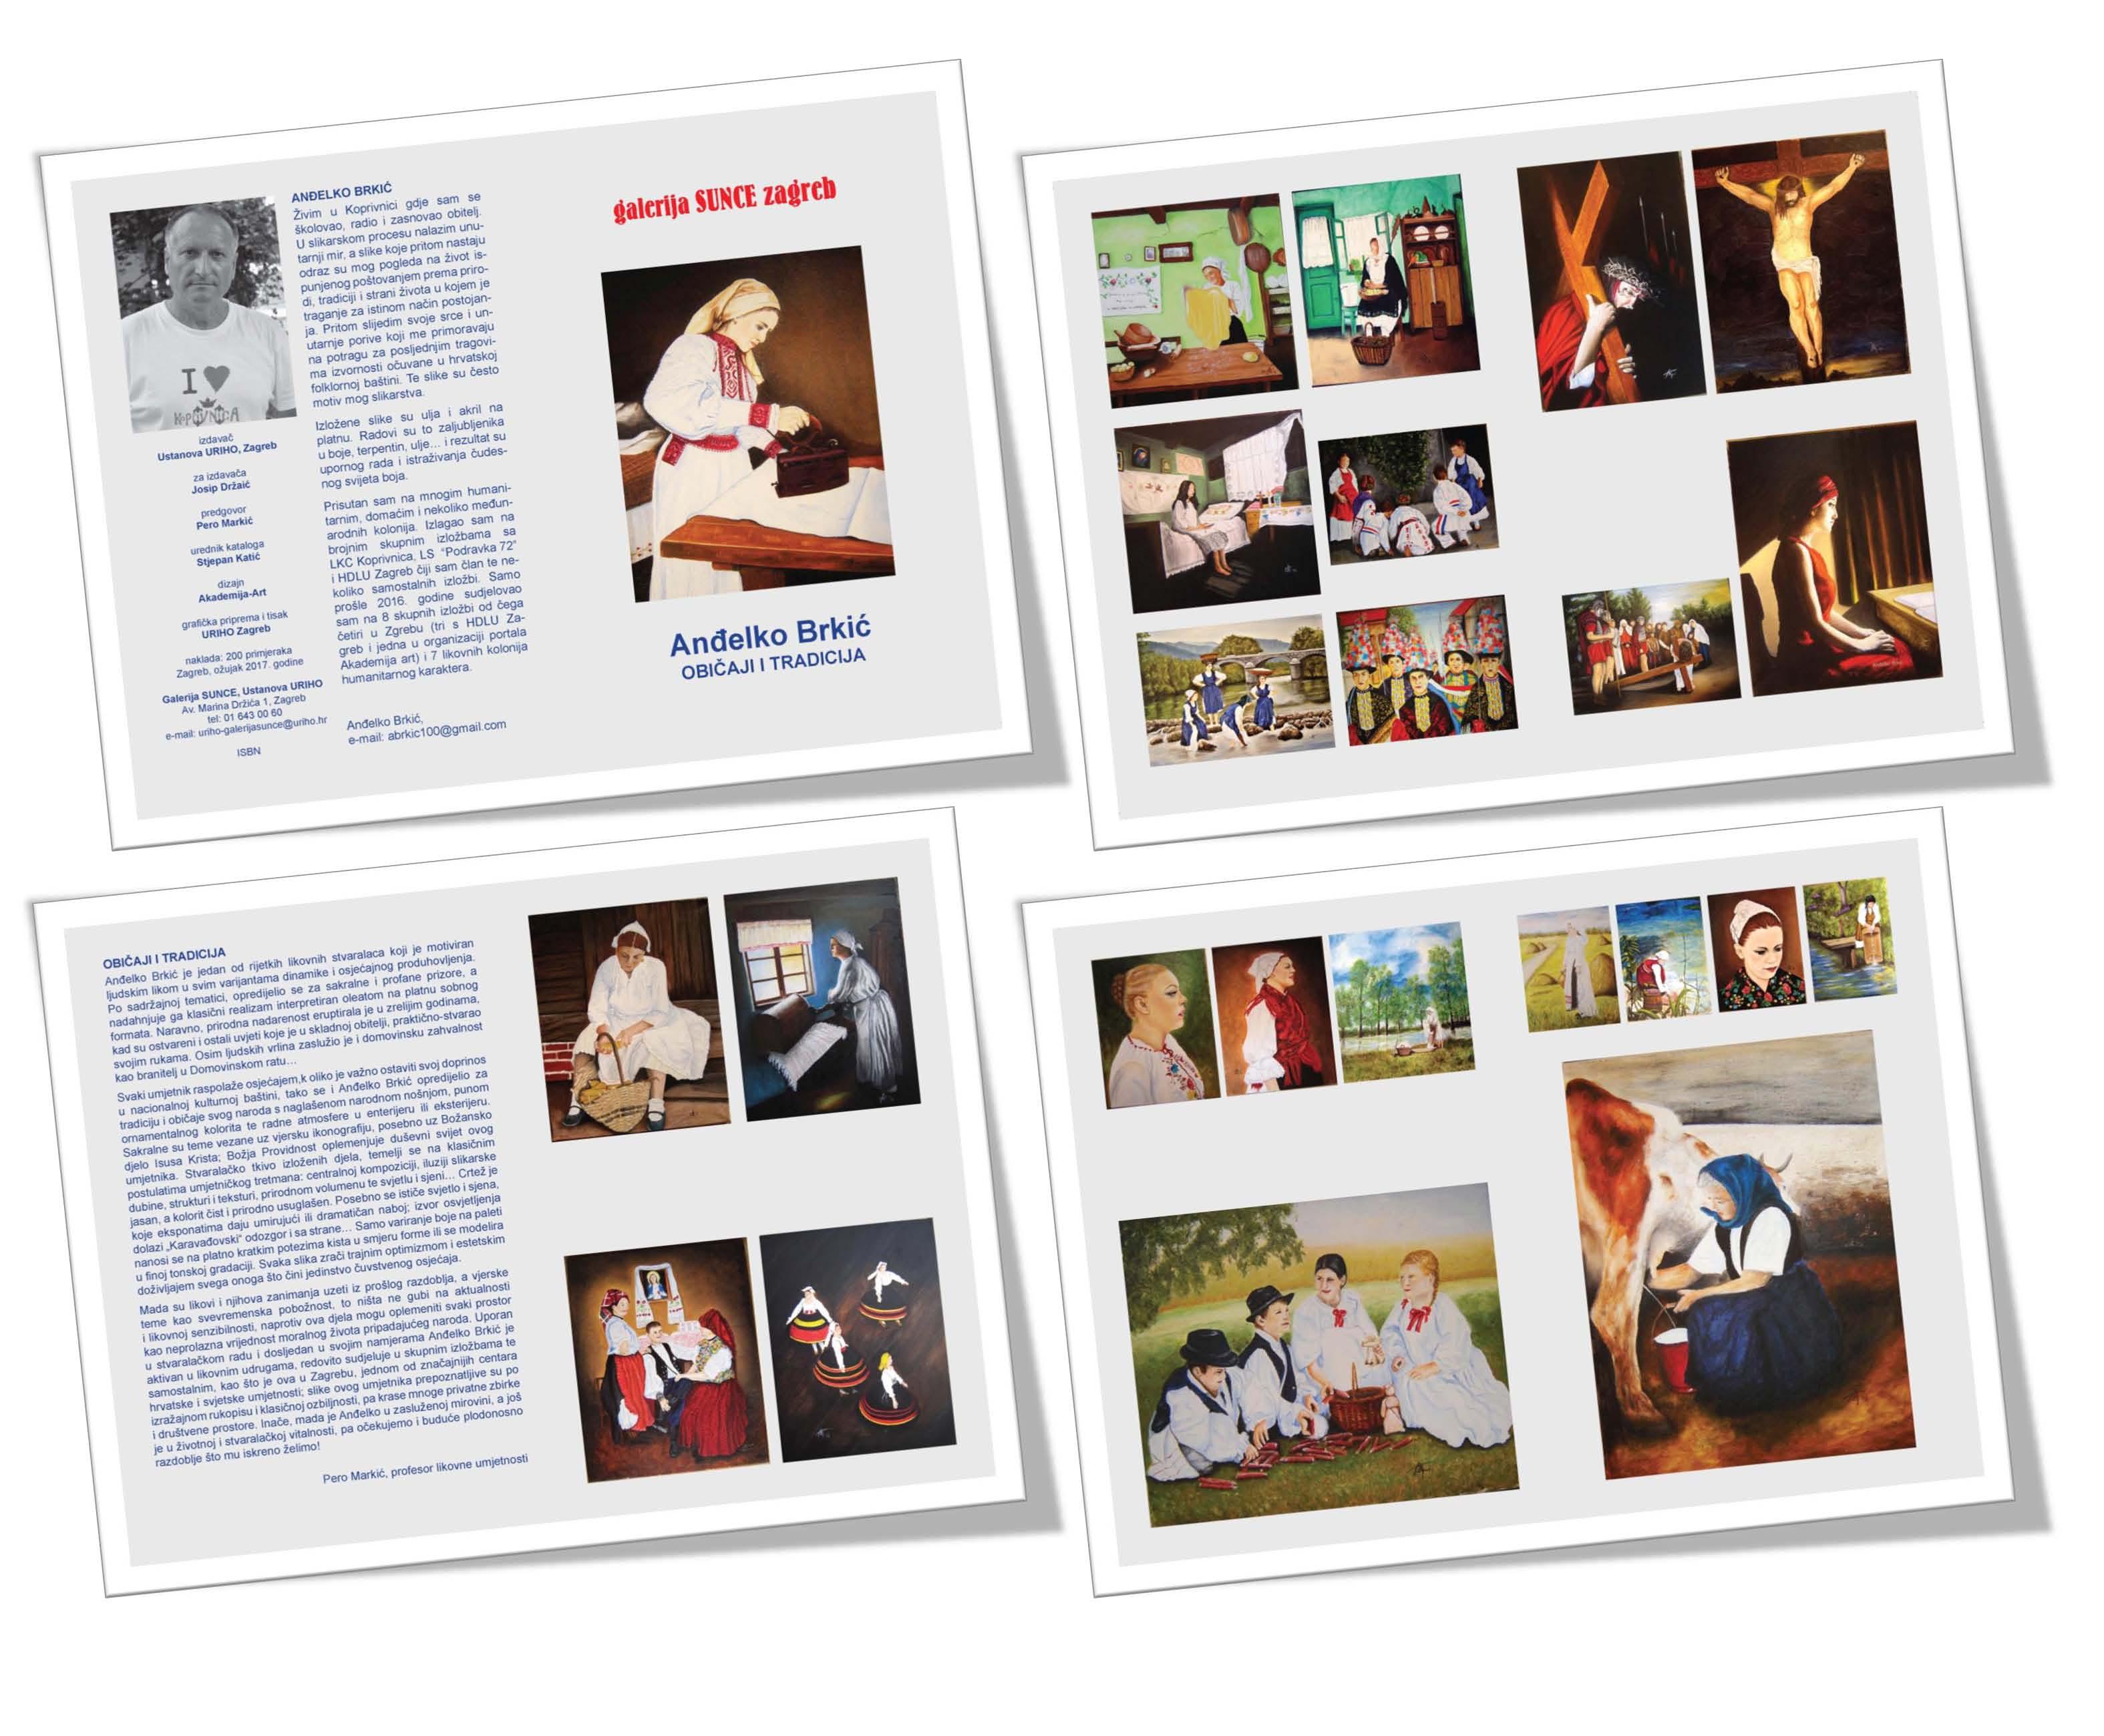 andjelko brkic katalog 1